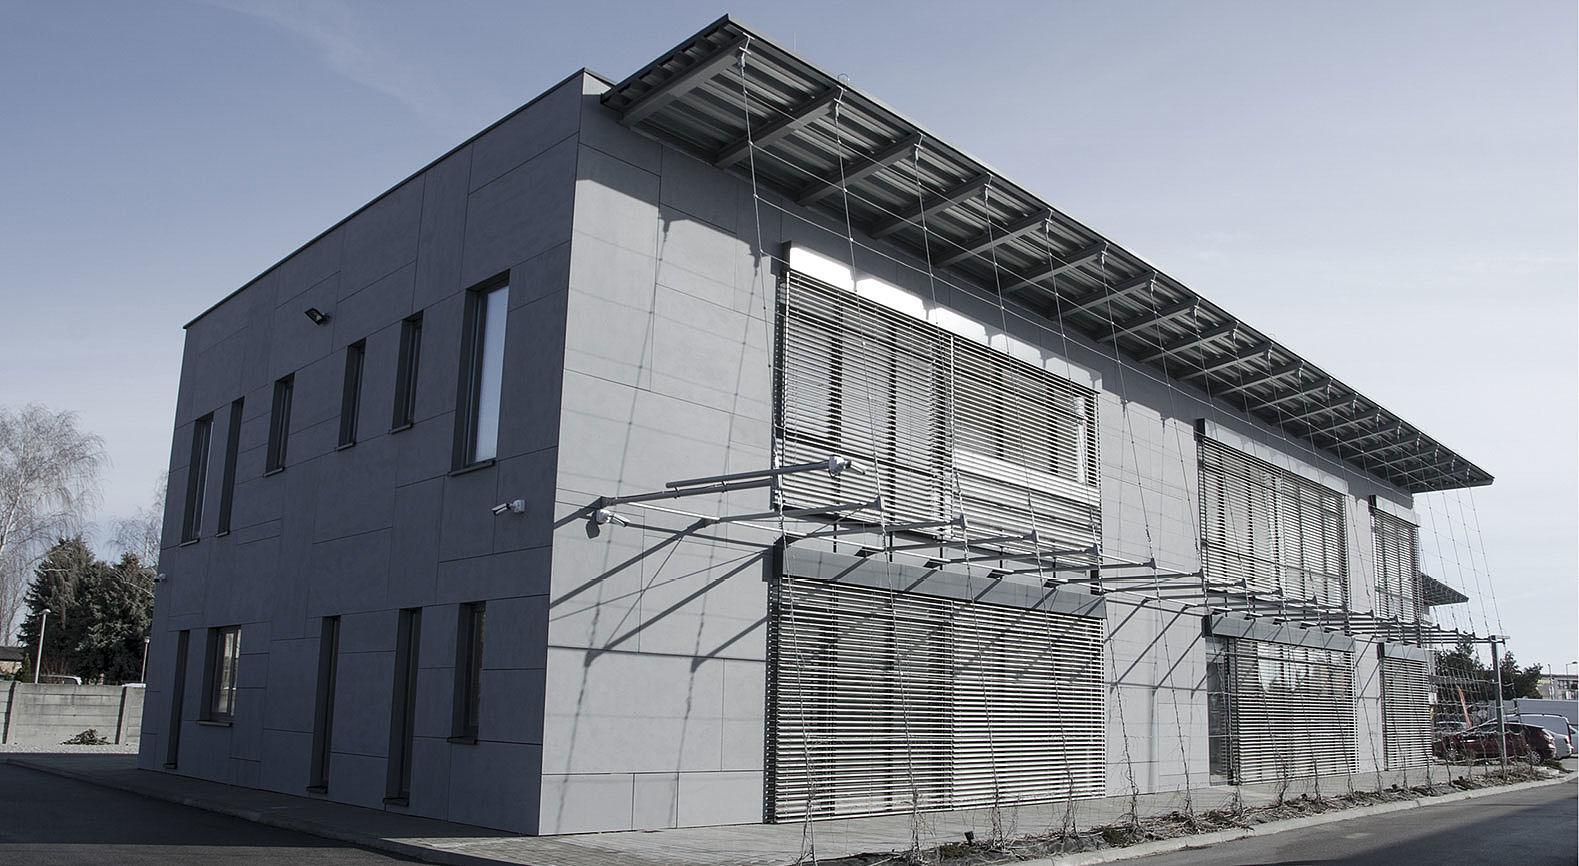 Stäubli AG - building-komarnoSK-fim@2x.jpg.jpg